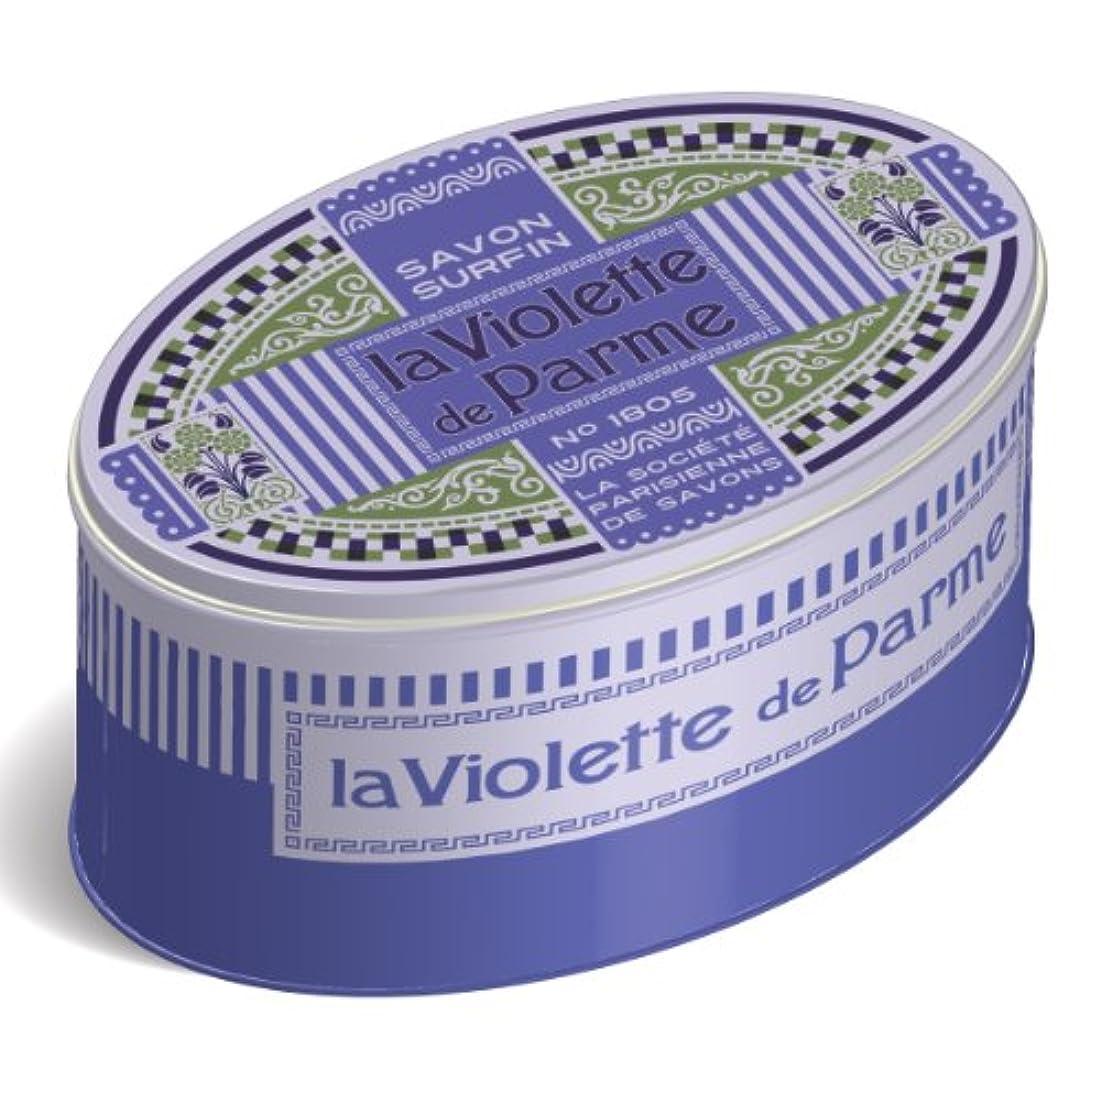 LA SOCIETE PARISIENNE DE SAVONS フレグランスソープ(缶入) 250g 「ラヴィオットデパルム」 3440576130614